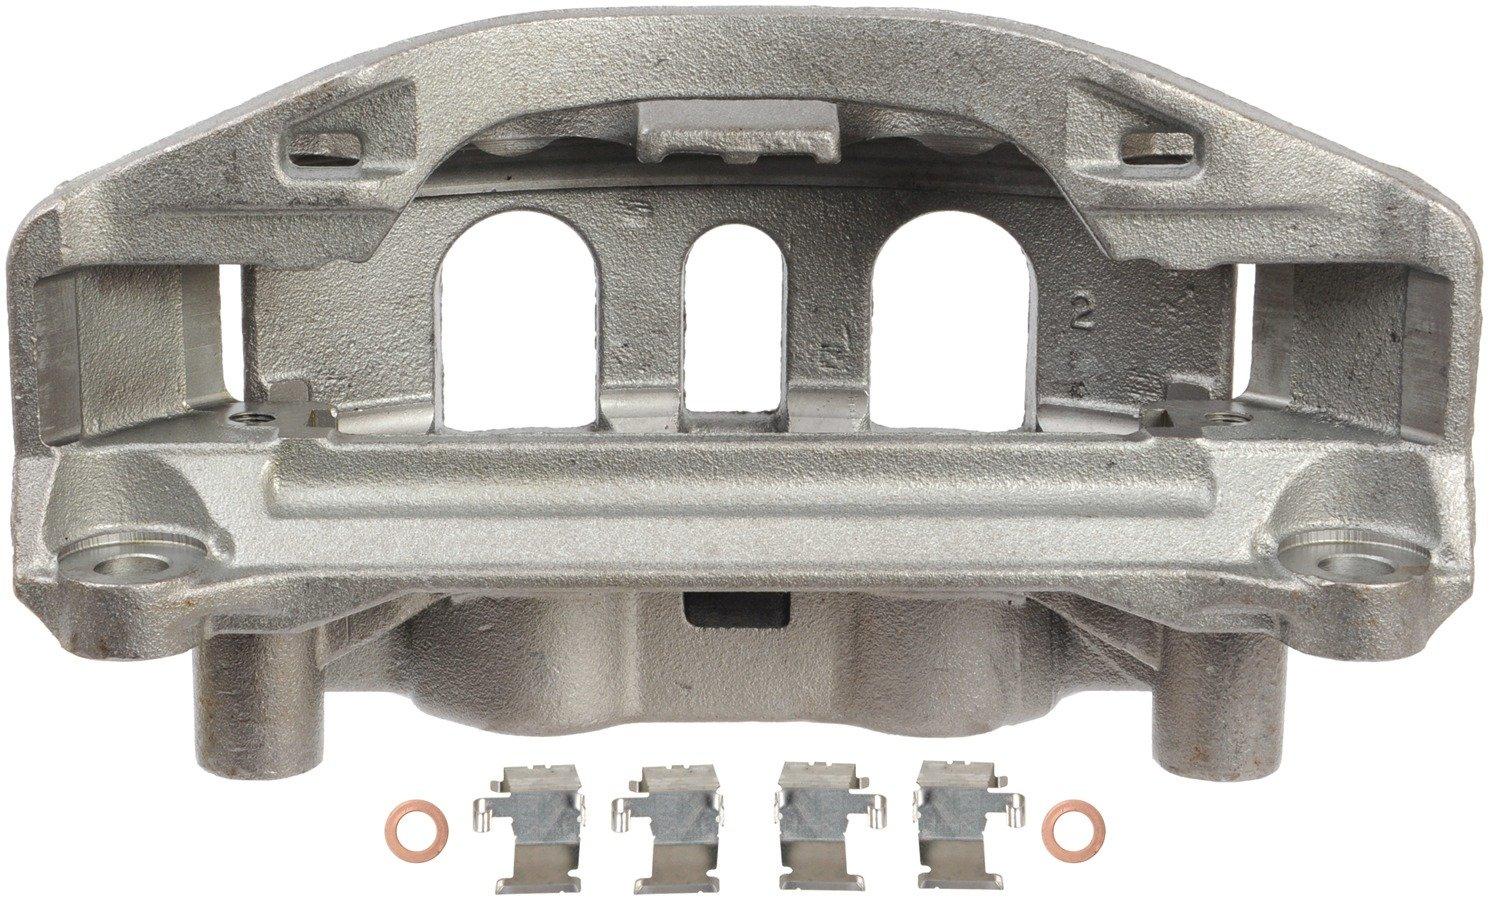 Remanufactured A1 Cardone 18-B5307 Unloaded Brake Caliper with Bracket